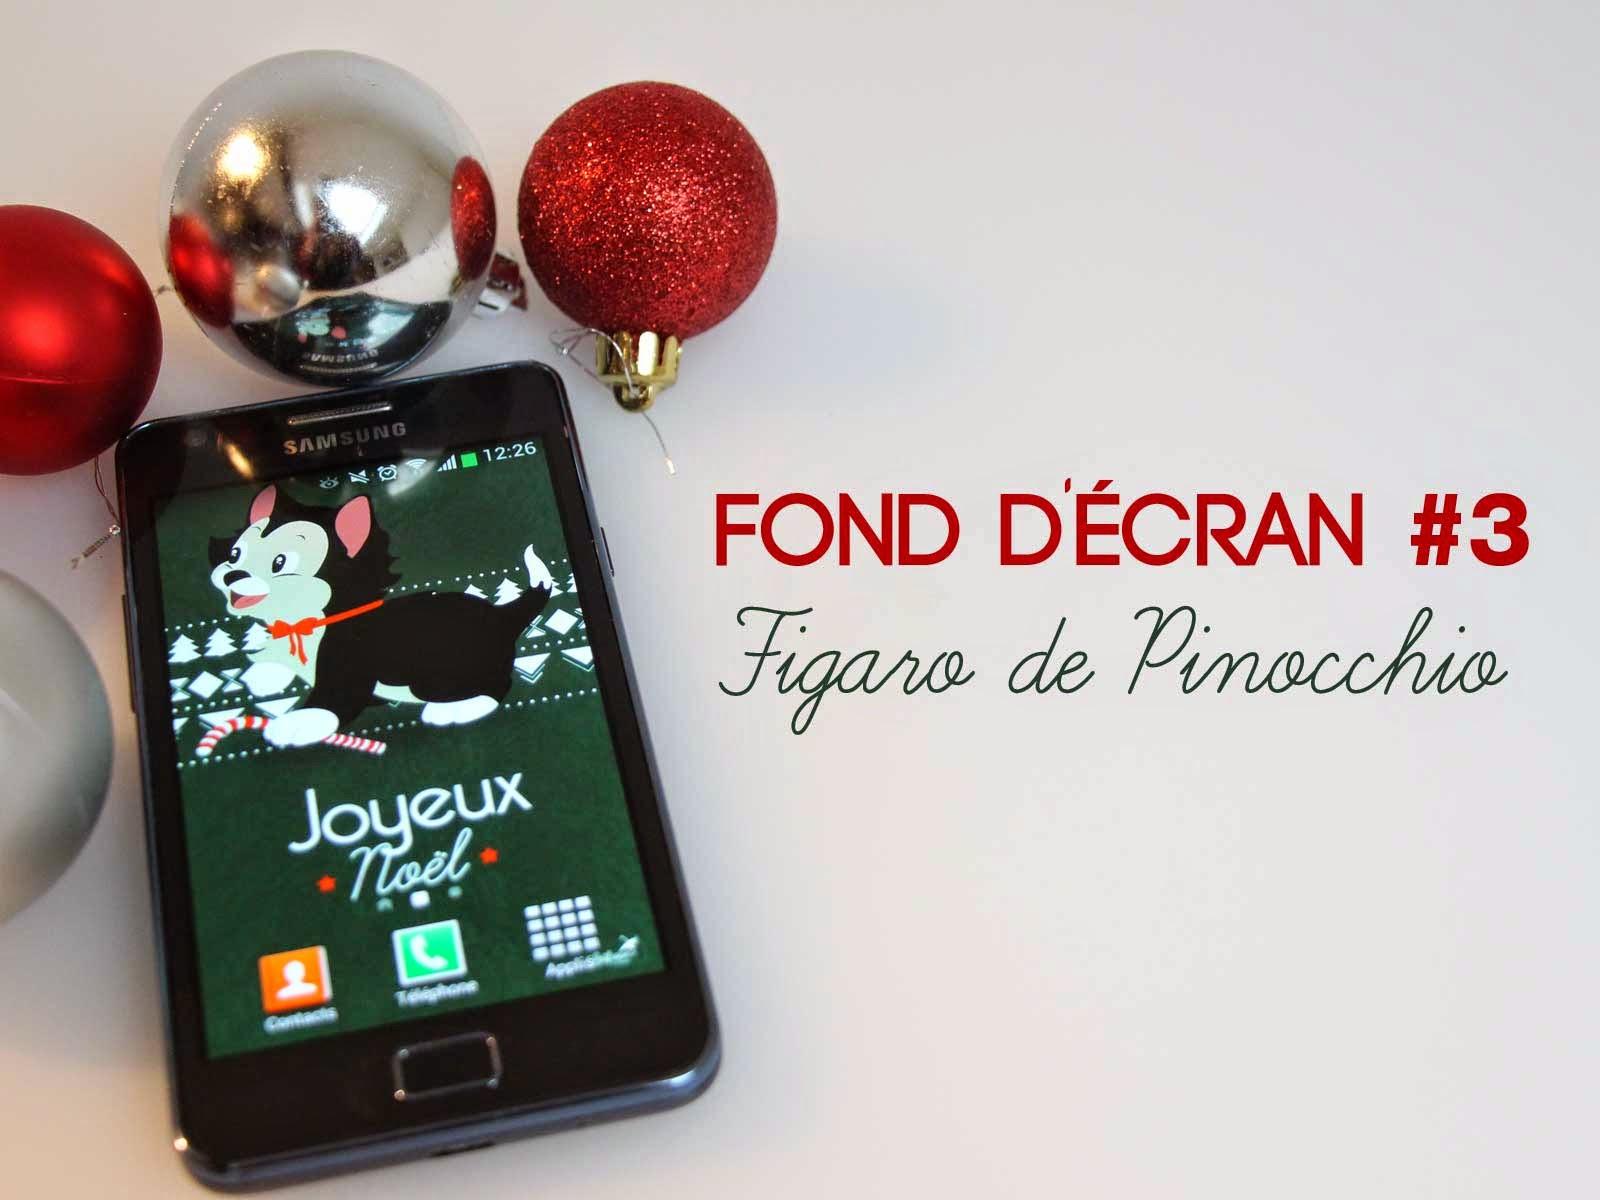 Fond d'écran - Figaro